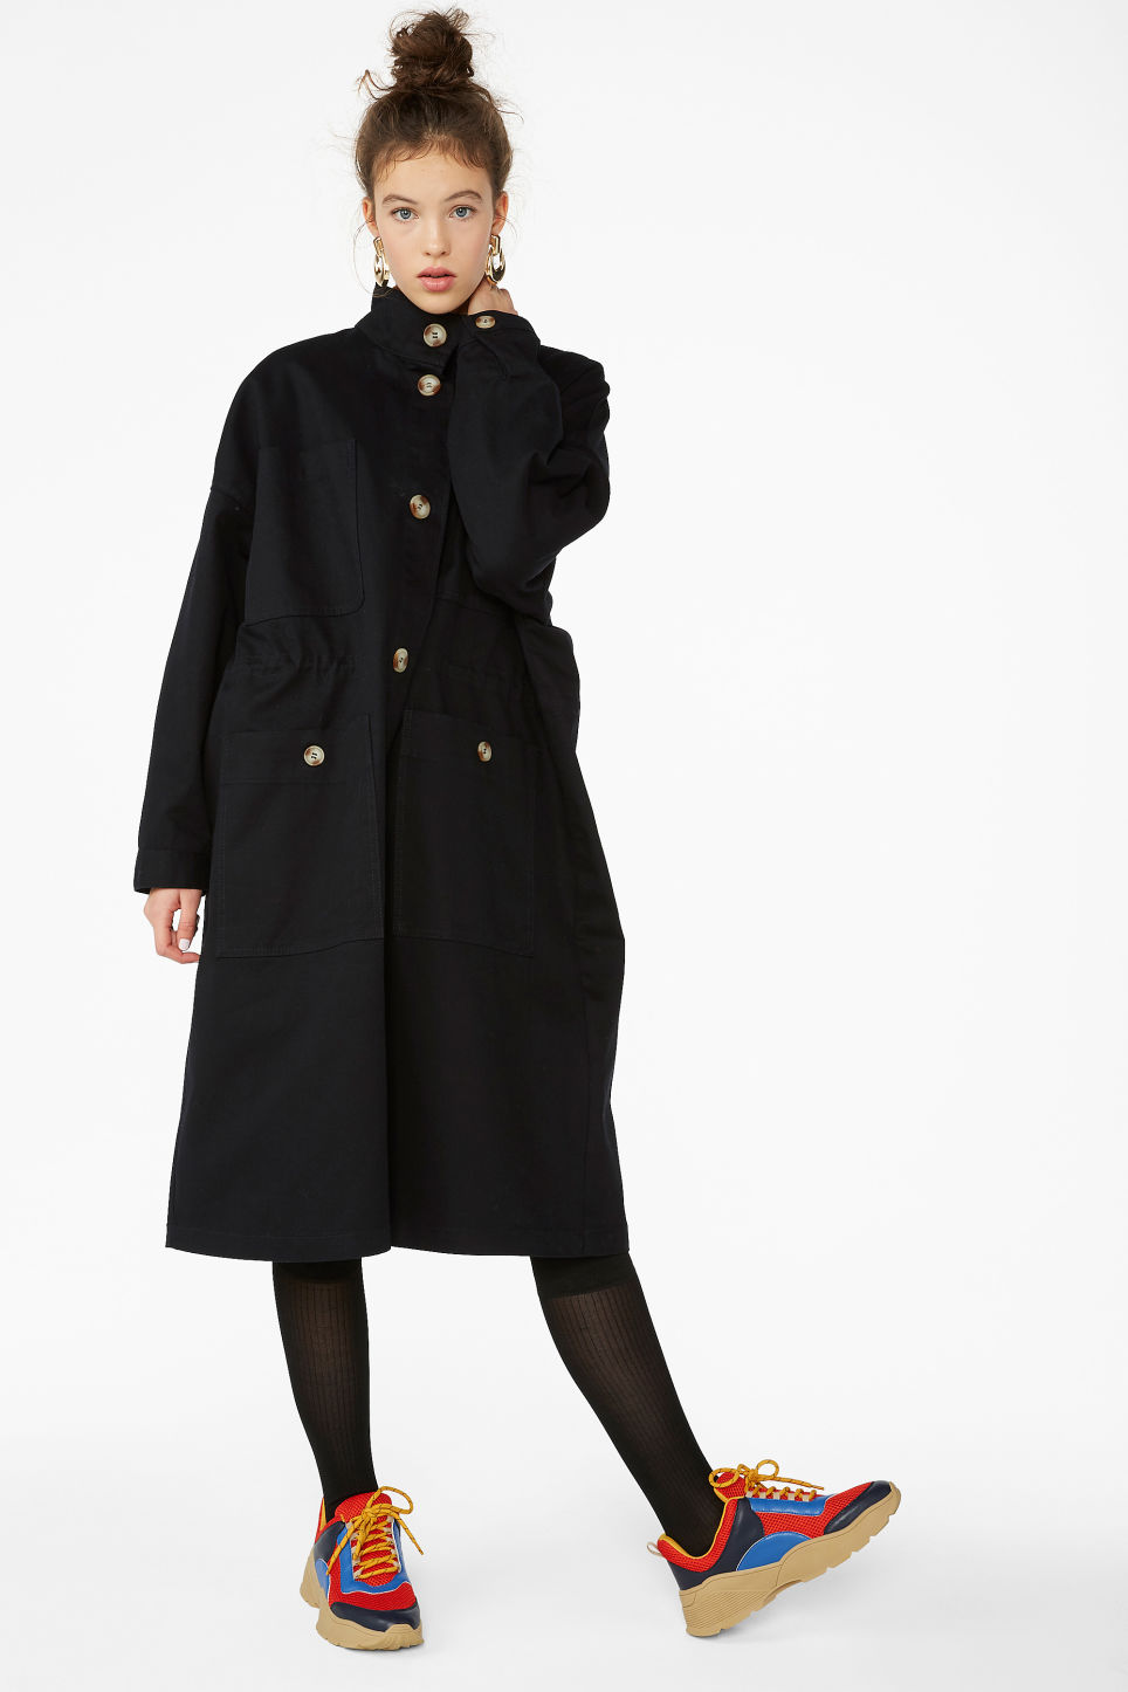 ee787822ba700 Utility jacket - Black magic - Coats   Jackets - Monki